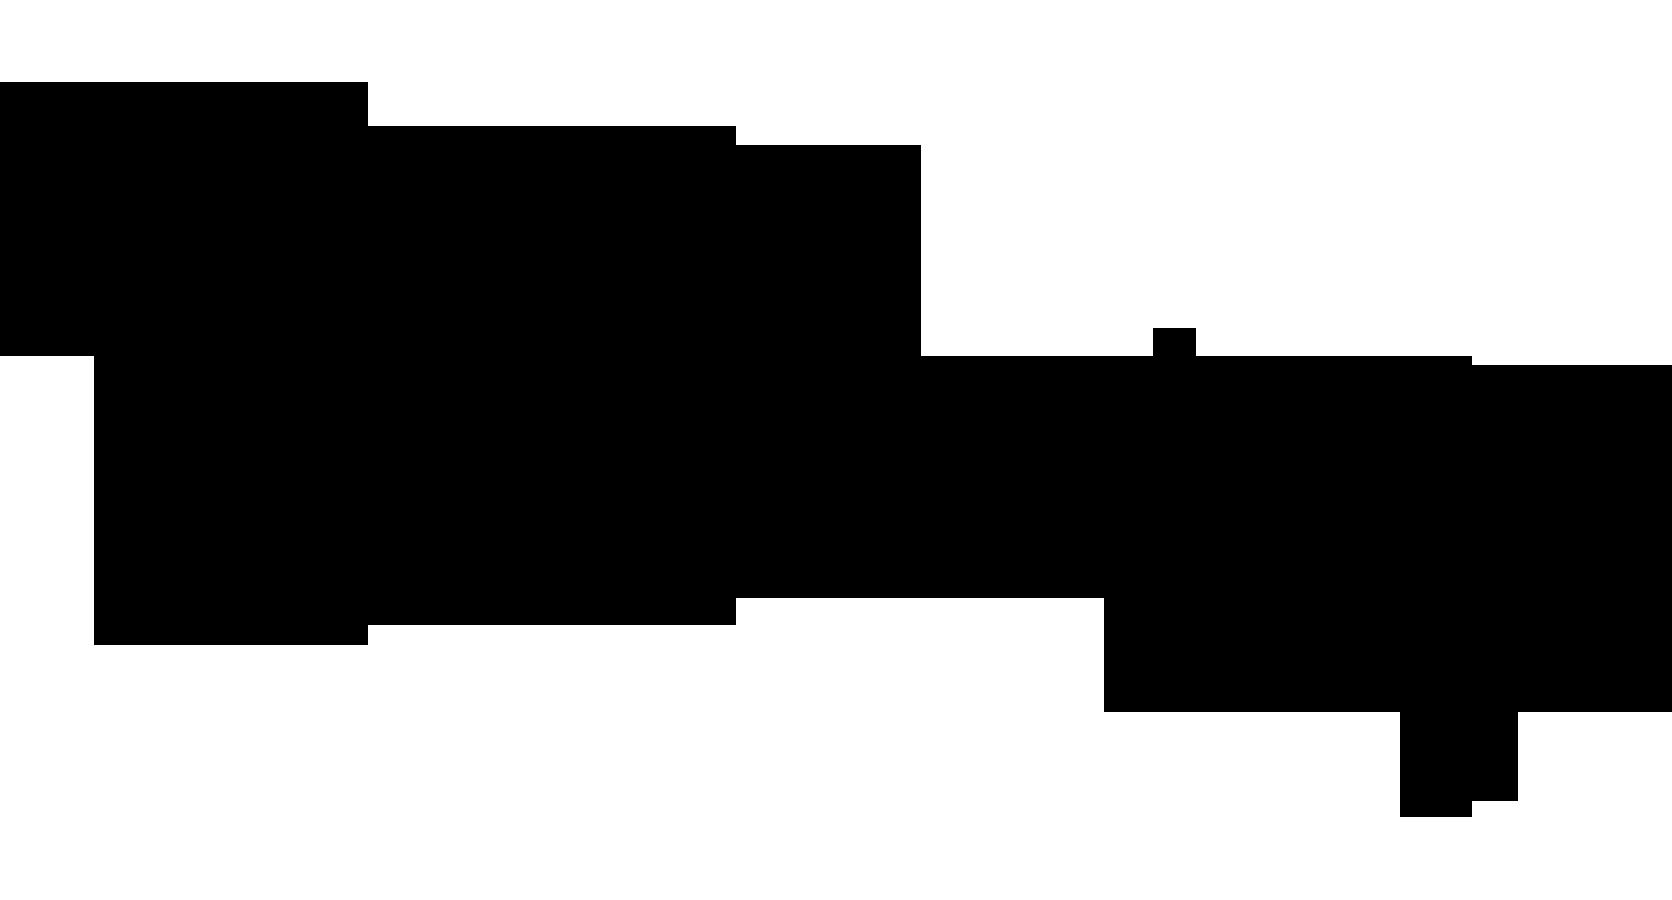 sacl_dis_disney_logo.png